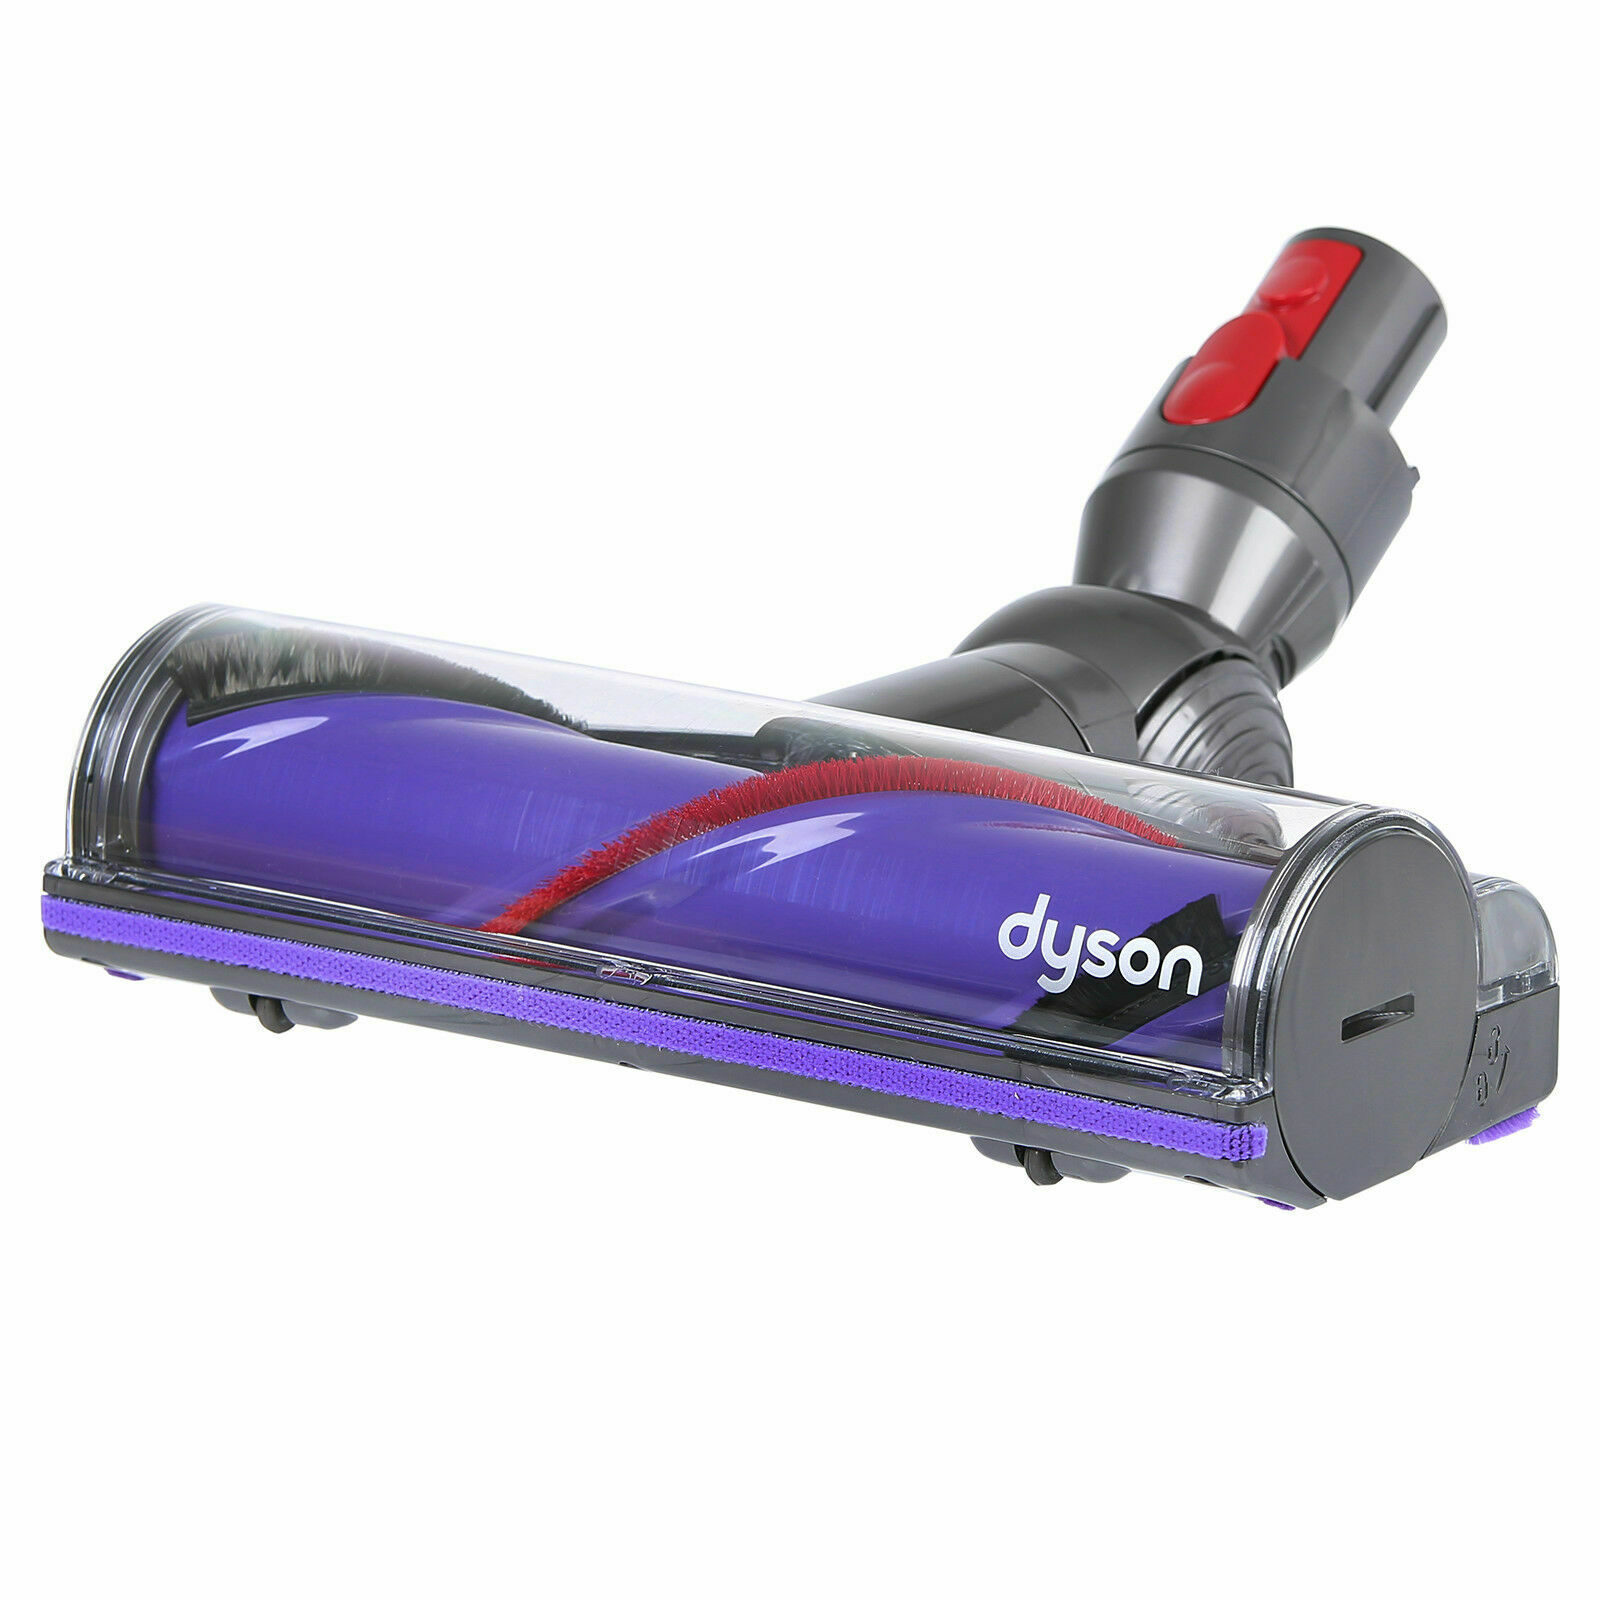 Dyson V8 Quick Release Motorhead